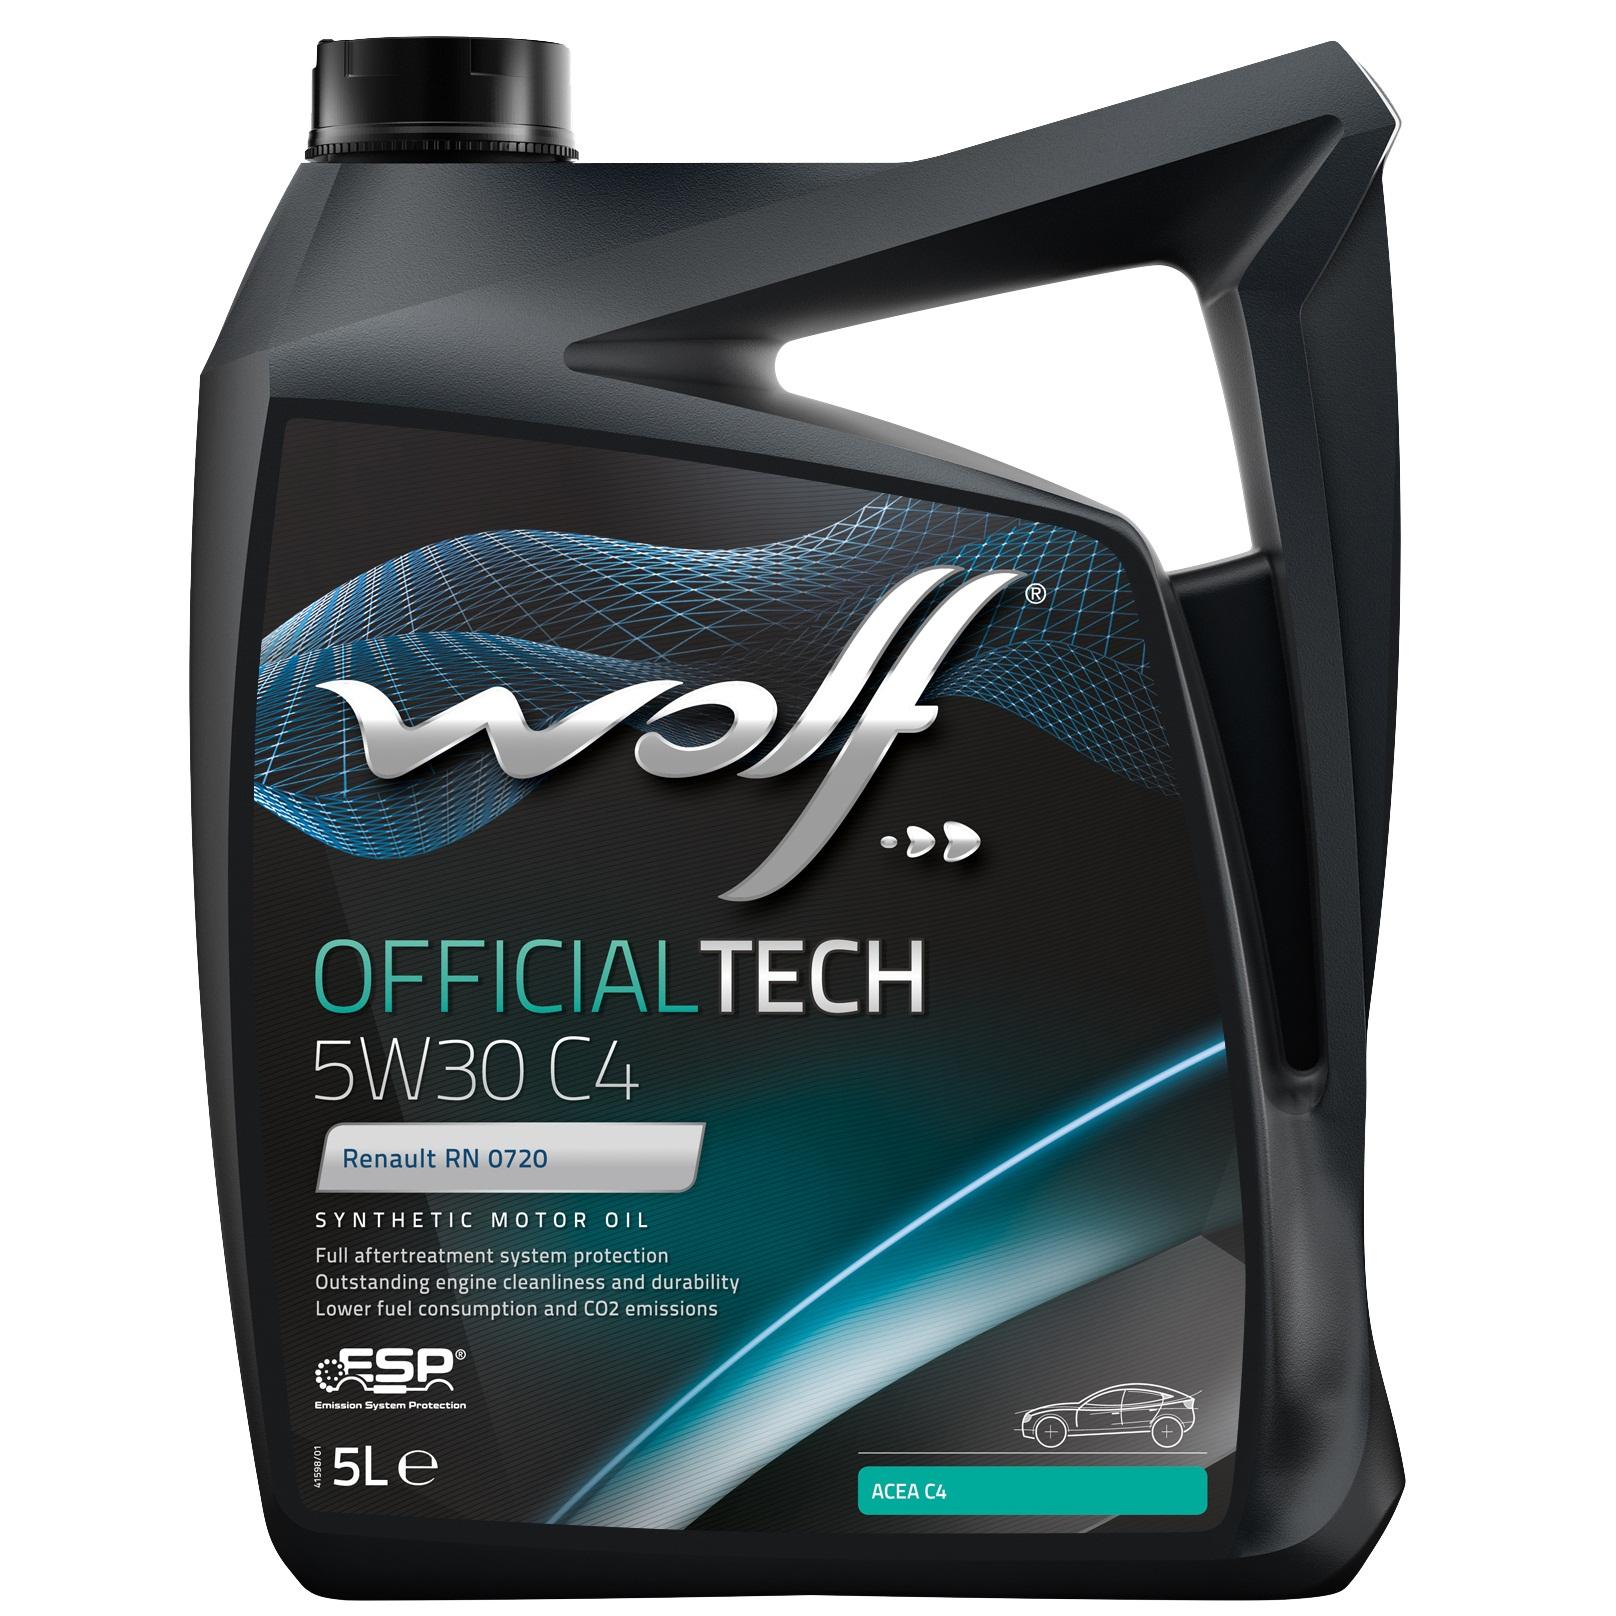 ULEI MOTOR WOLF OFFICIALTECH C4 5W30 5L